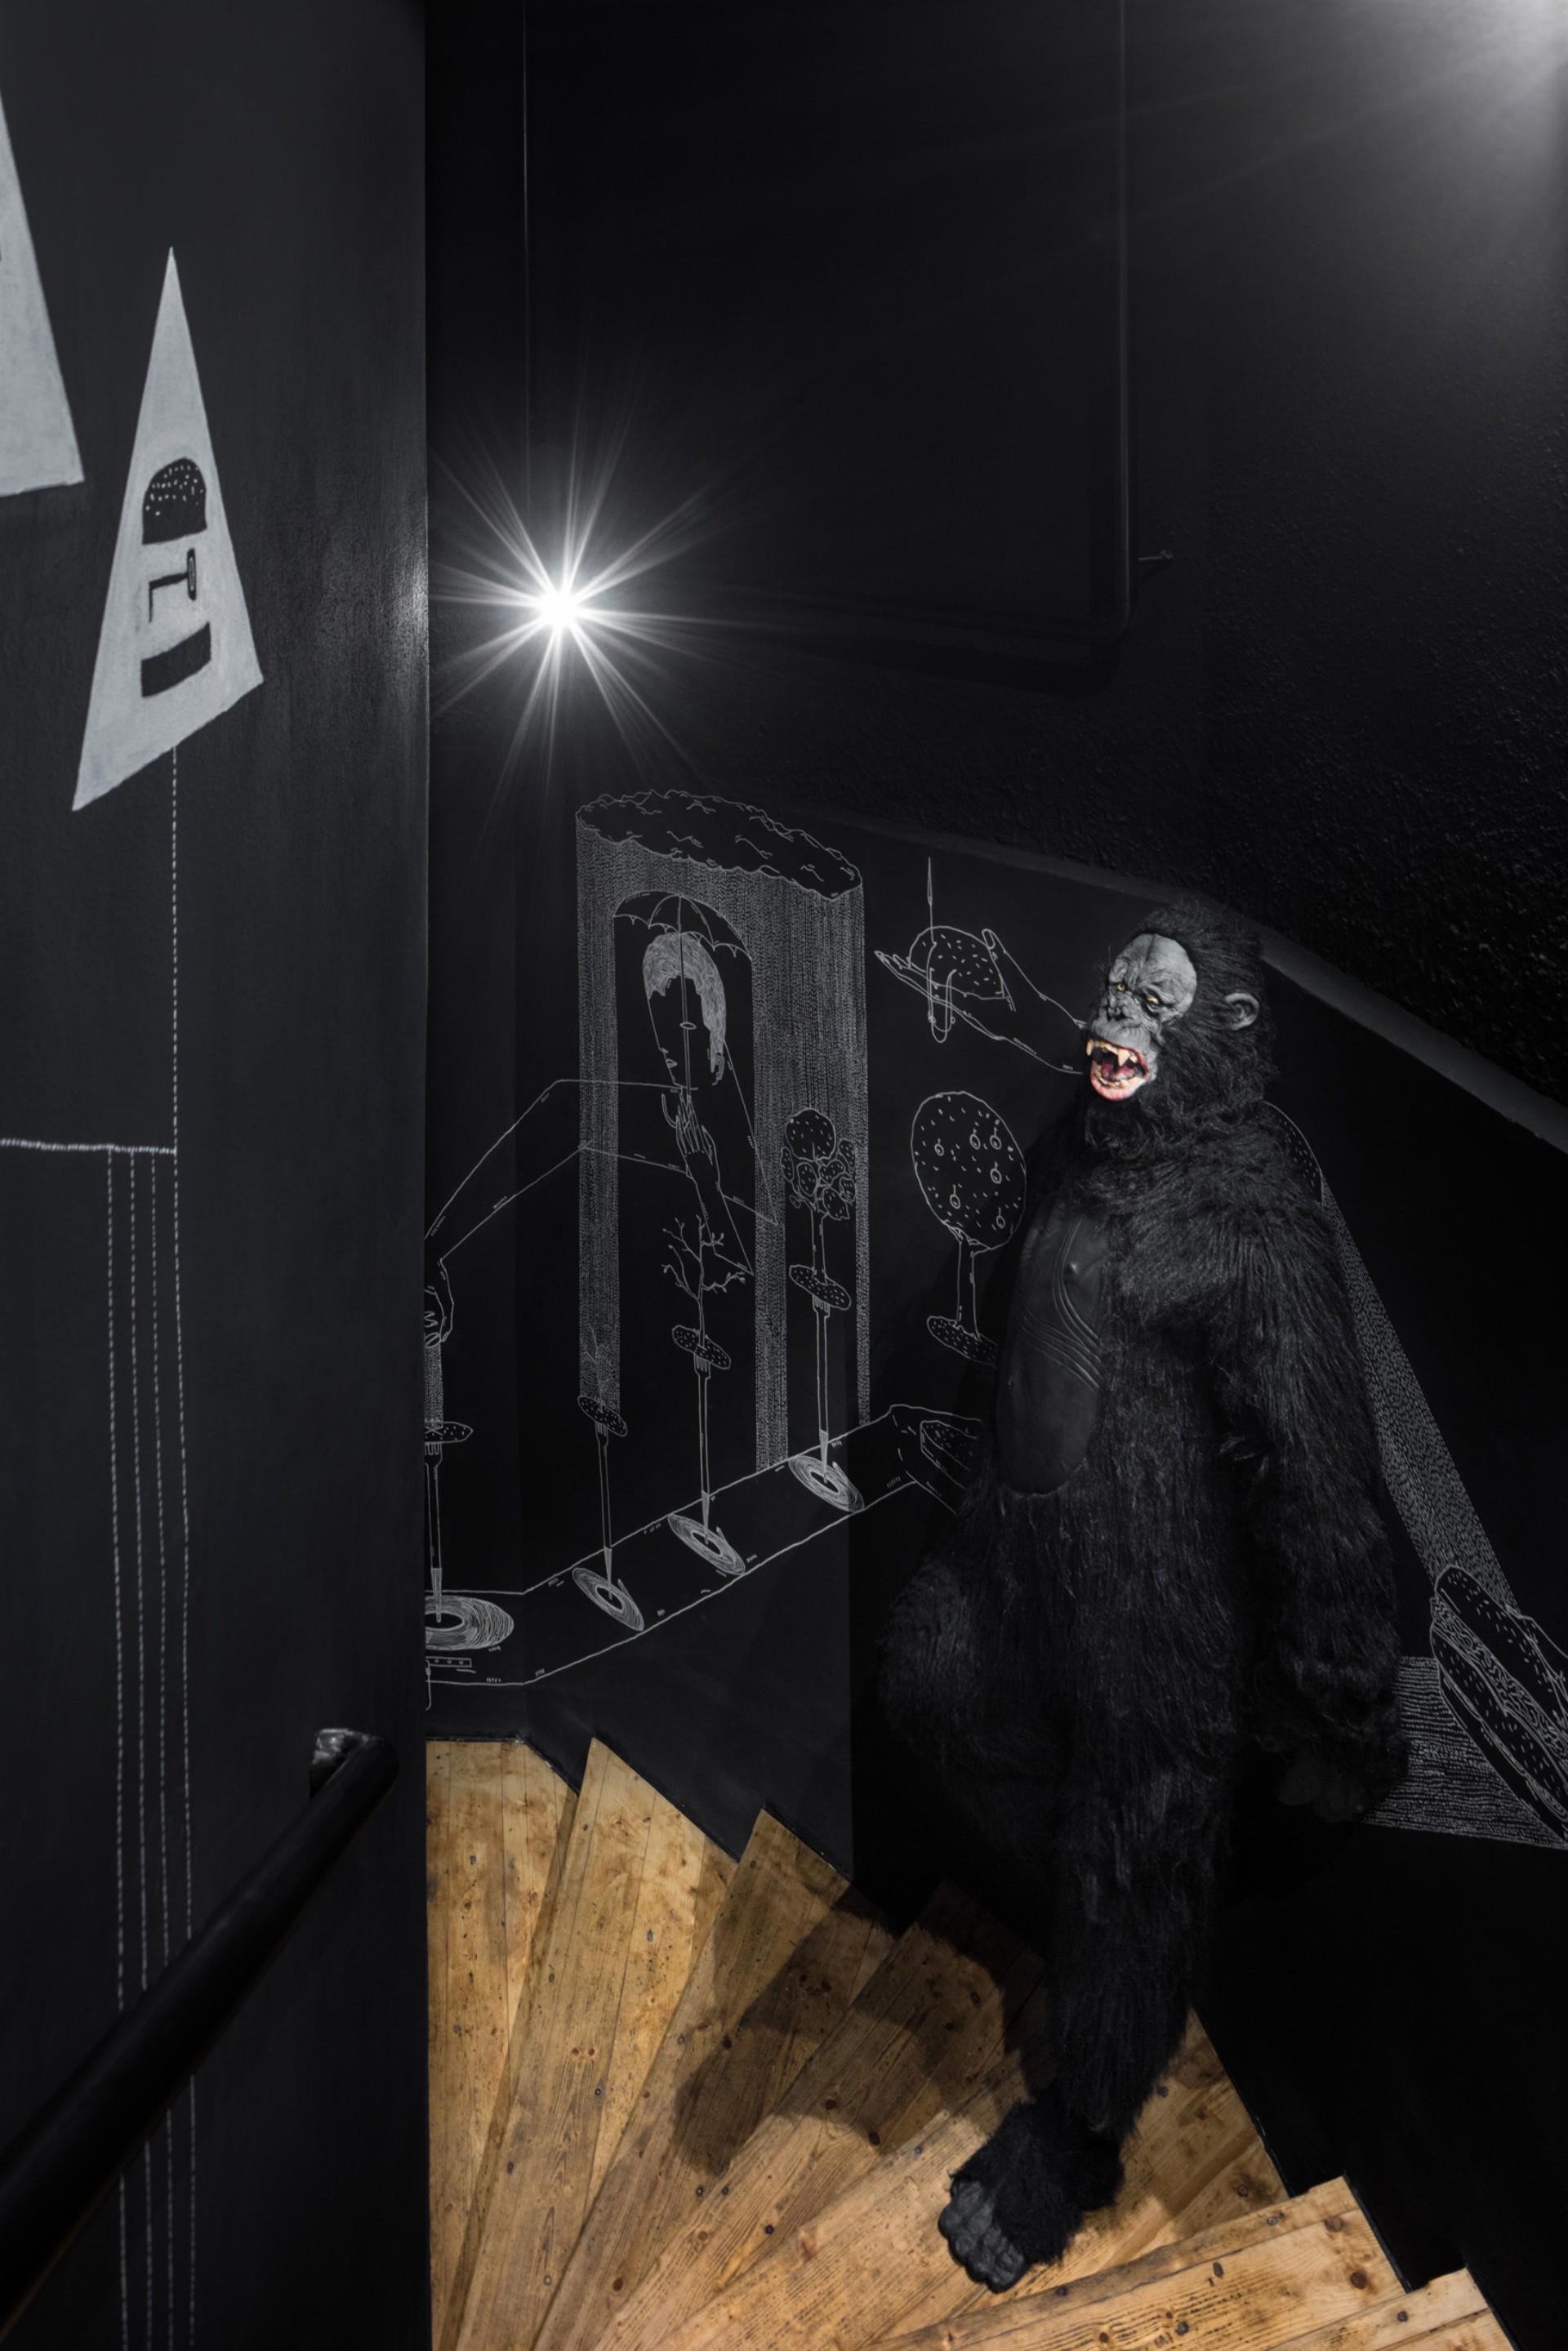 Czech studio Mjölk brings Chicago to Liberec